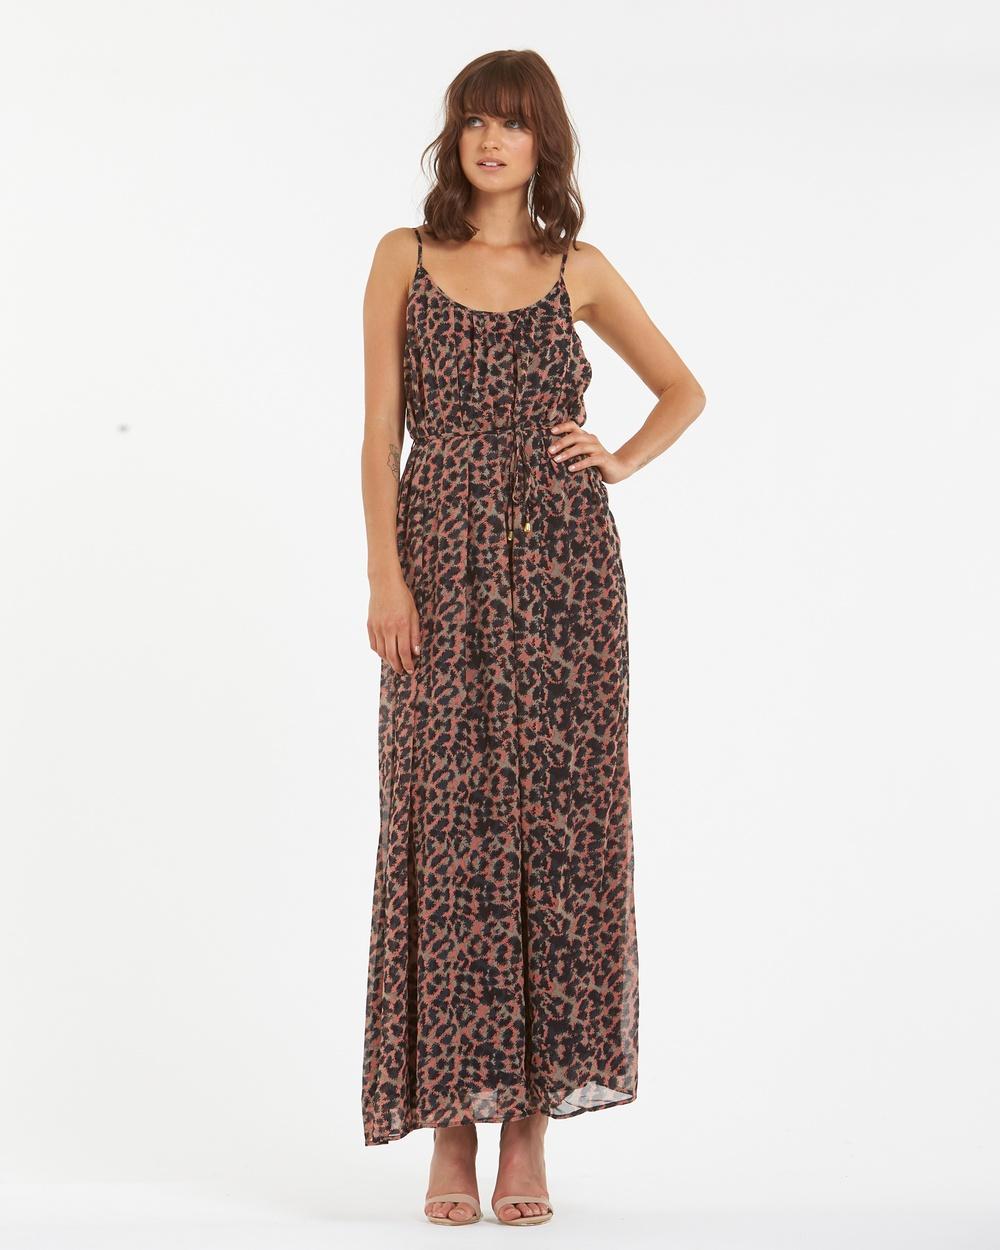 Amelius Cora Maxi Dress Printed Dresses Multi Cora Maxi Dress